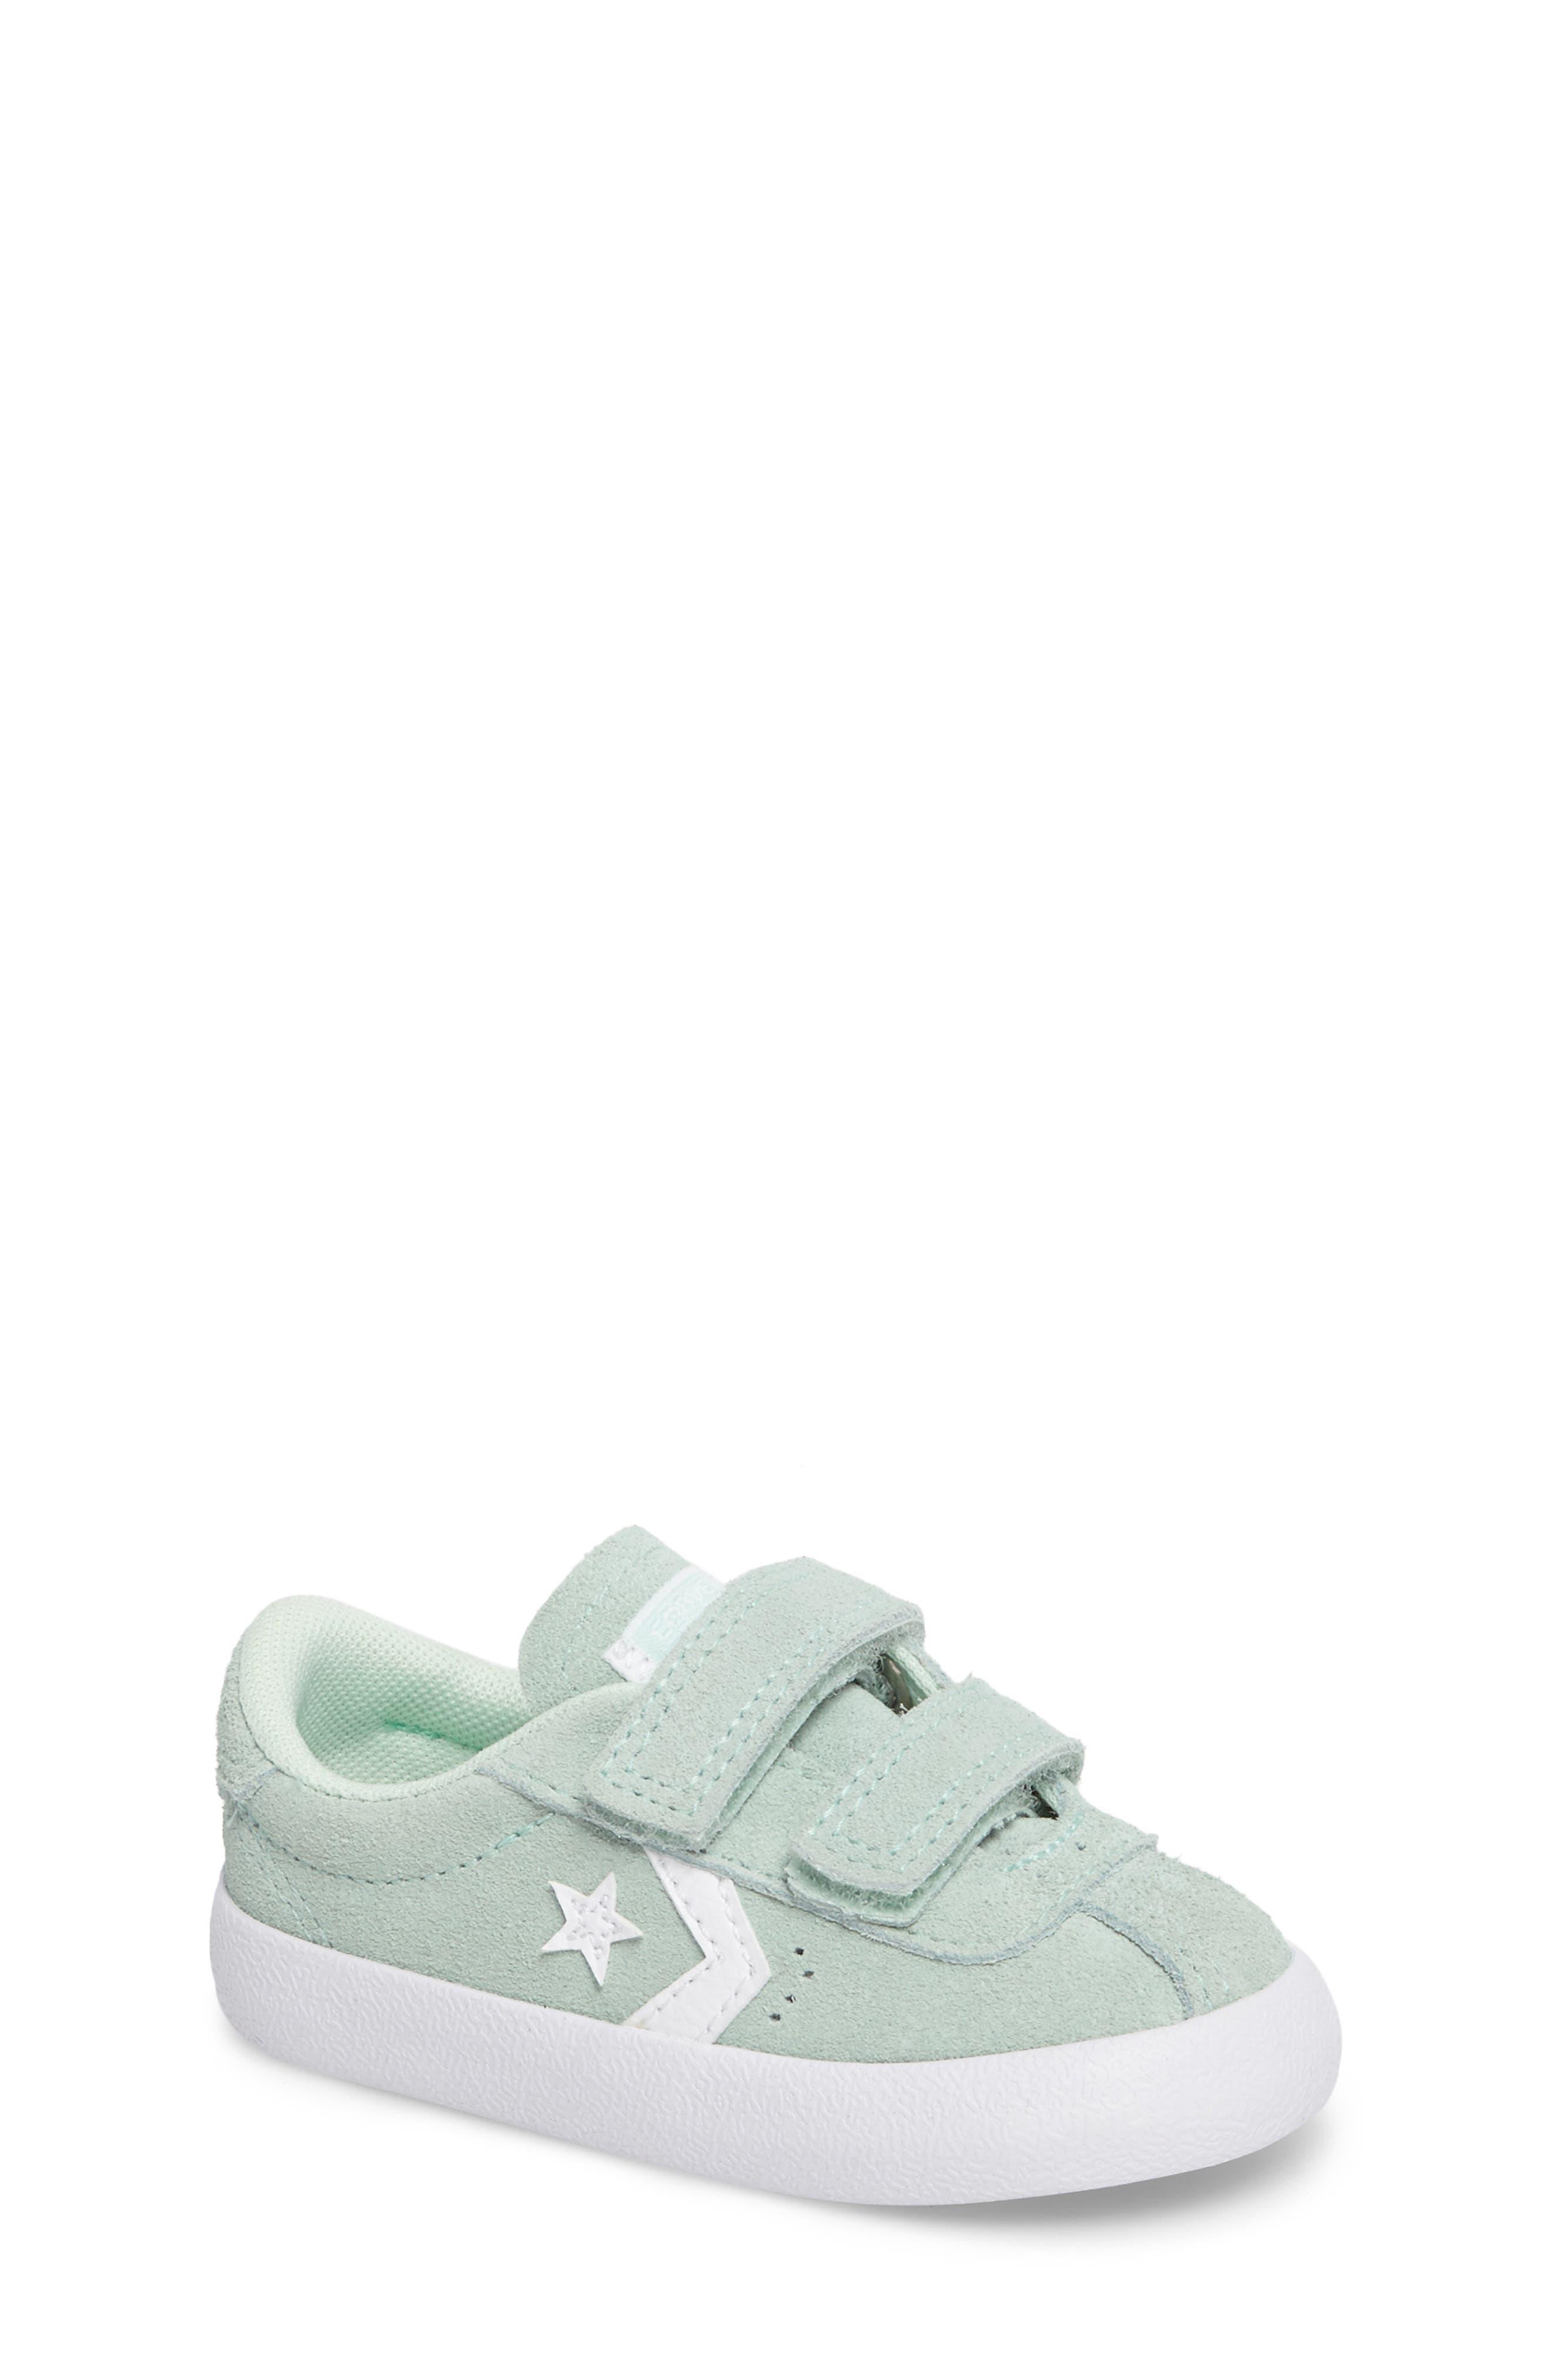 Breakpoint Sneaker,                         Main,                         color, 300